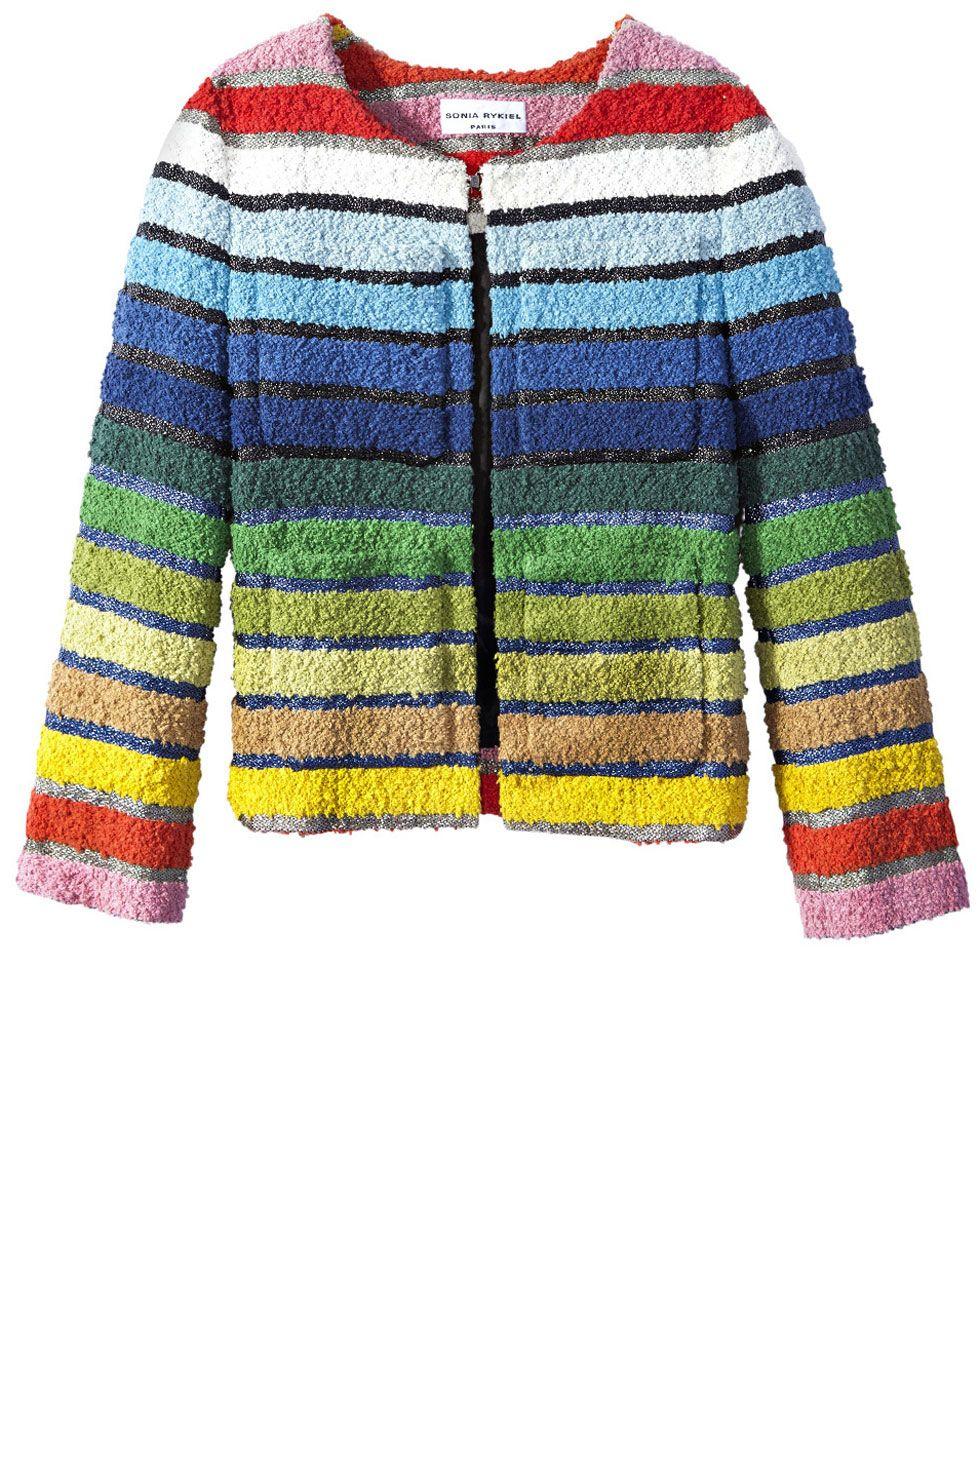 "<p><strong>Sonia Rykiel </strong>jacket, $1,490, <strong><a href=""https://shop.harpersbazaar.com/designers/s/sonia-rykiel/rainbow-tweed-jacket-6194.html"" target=""_blank"">shopBAZAAR.com</a>.</strong><br></p>"